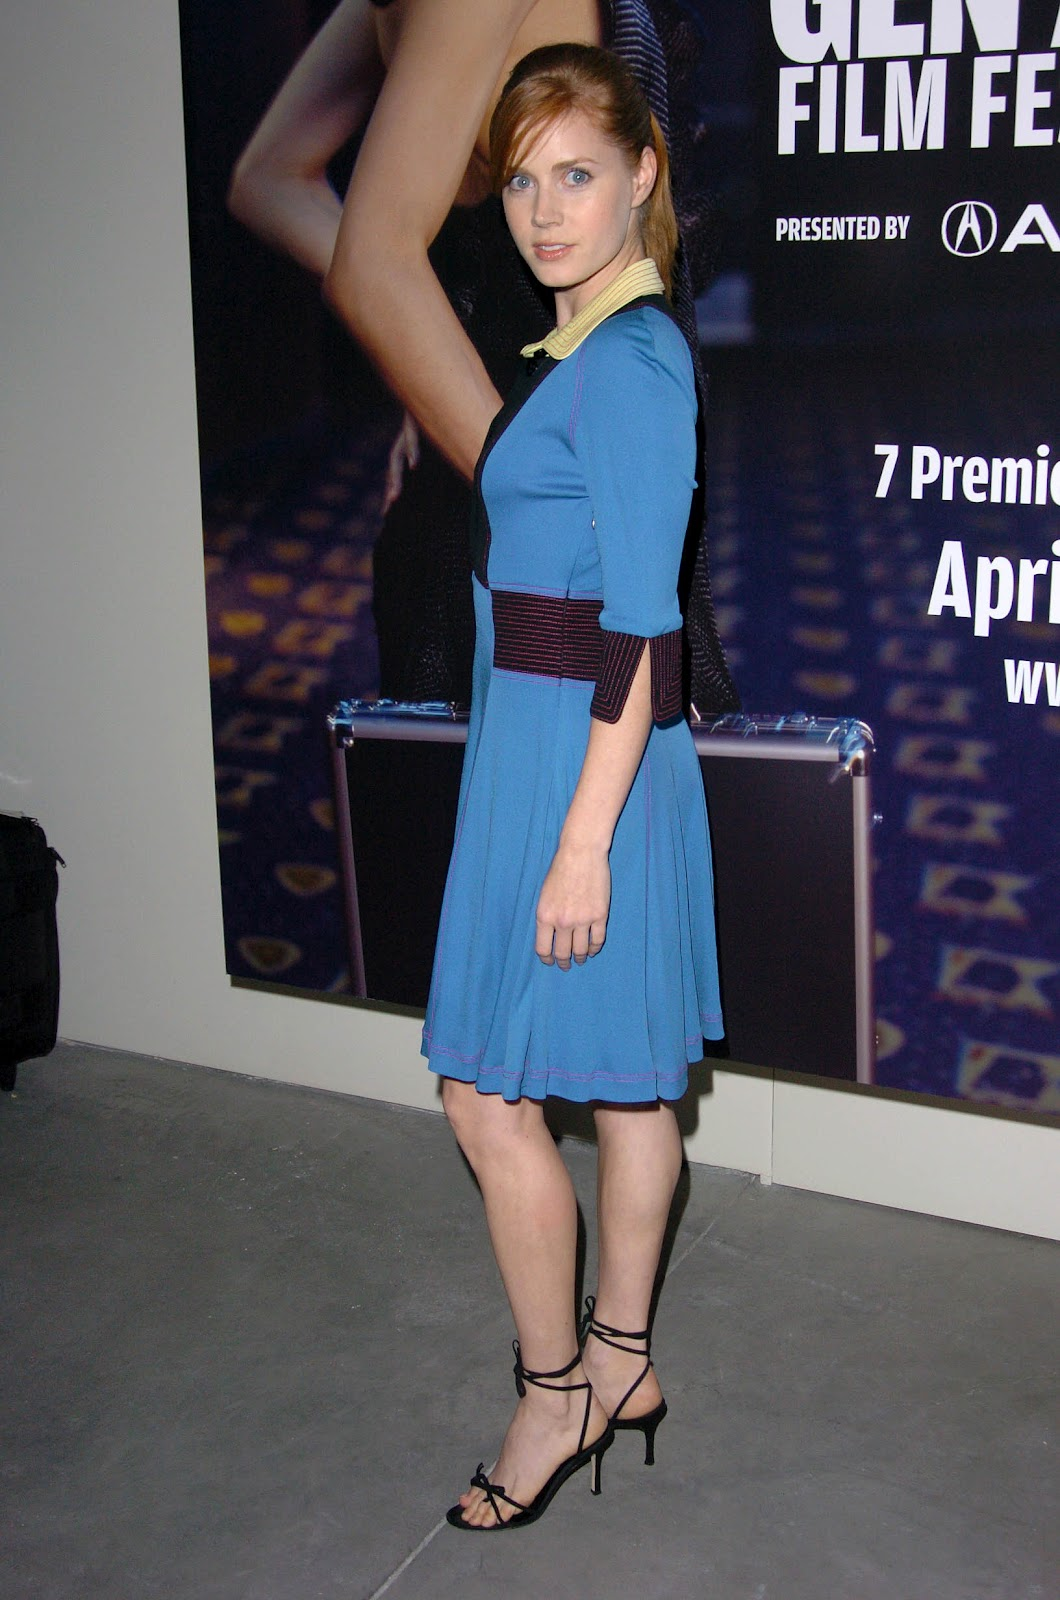 Amy Adams Wikifeet amy adams feet | celebrity pictures